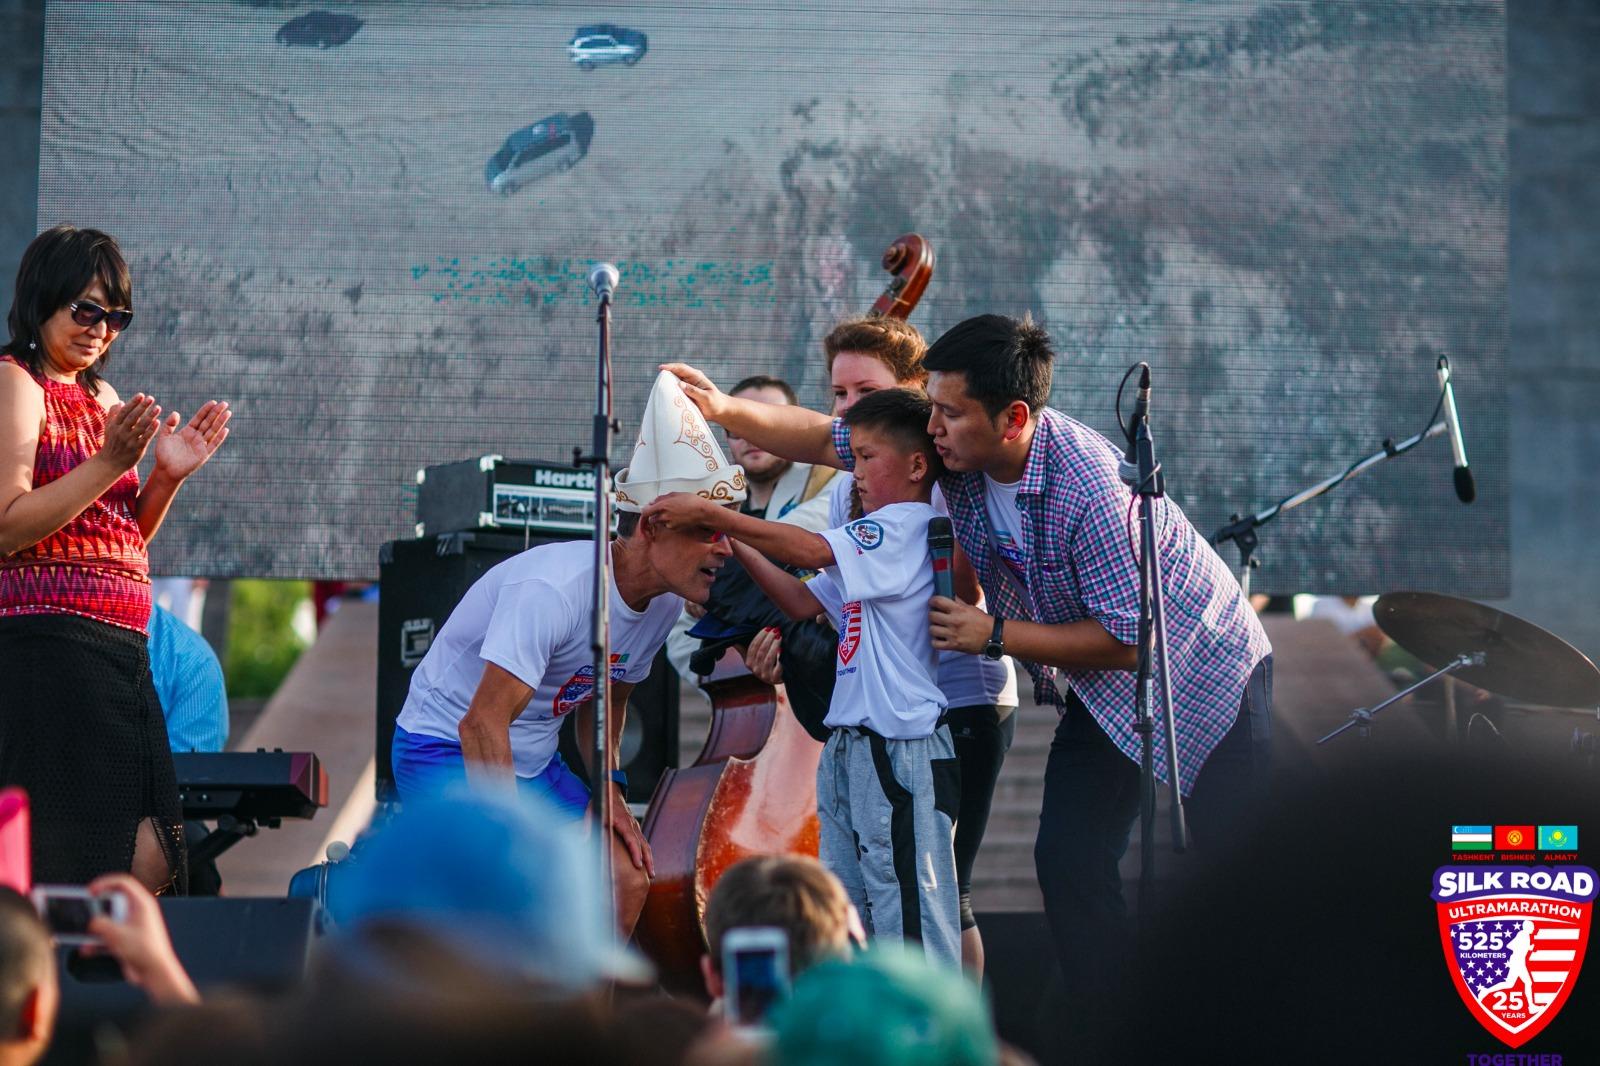 Dean receiving Kyrgyz hat at a concert